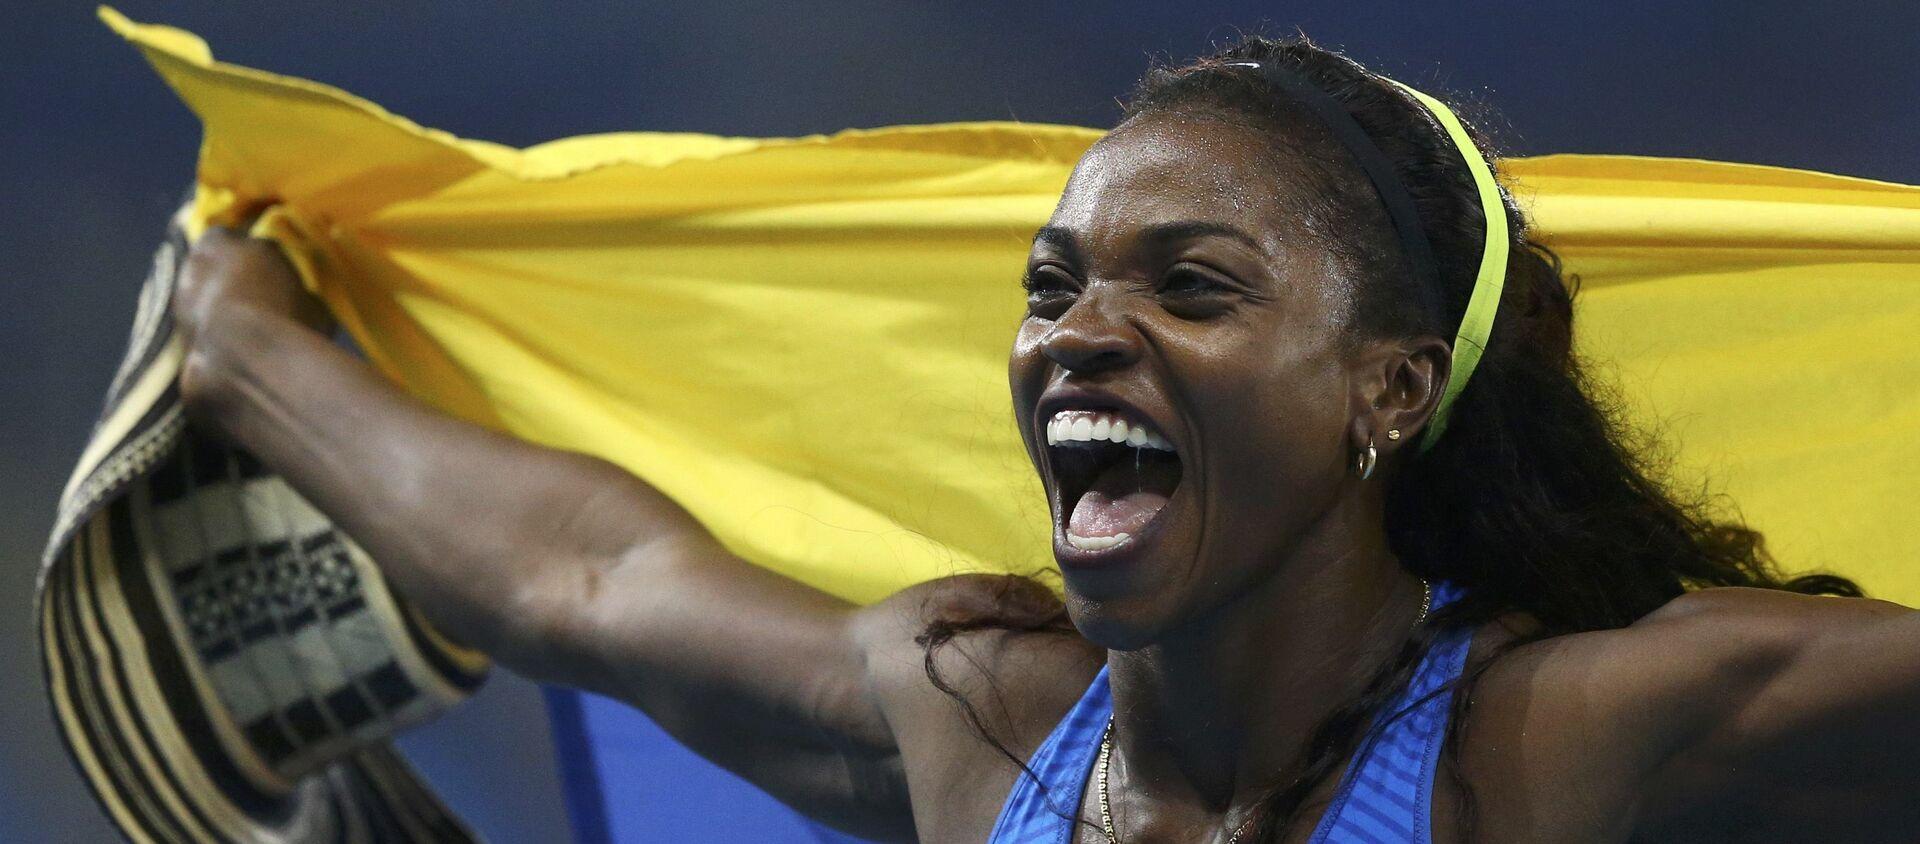 Caterine Ibargüen, atleta colombiana, medallista de oro olímpico - Sputnik Mundo, 1920, 16.08.2016